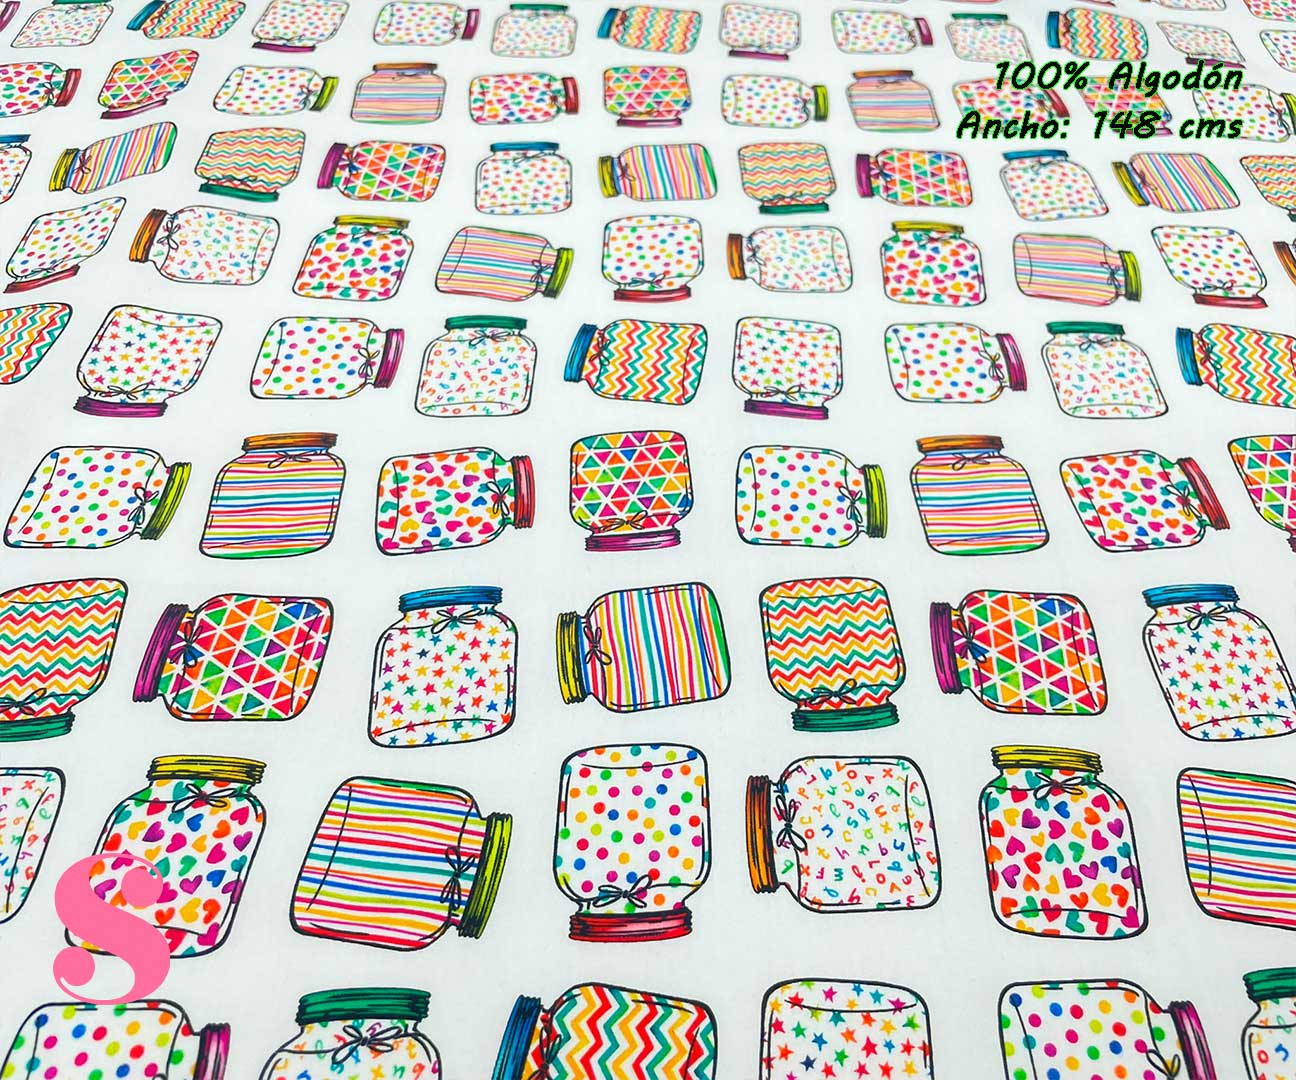 54-telas-estampadas-de-algodón,-telas-floreadas,estampados-floreados-de-algodón,estampados-origonales-de-algodón,Tejido Estampado Tarros Multicolor